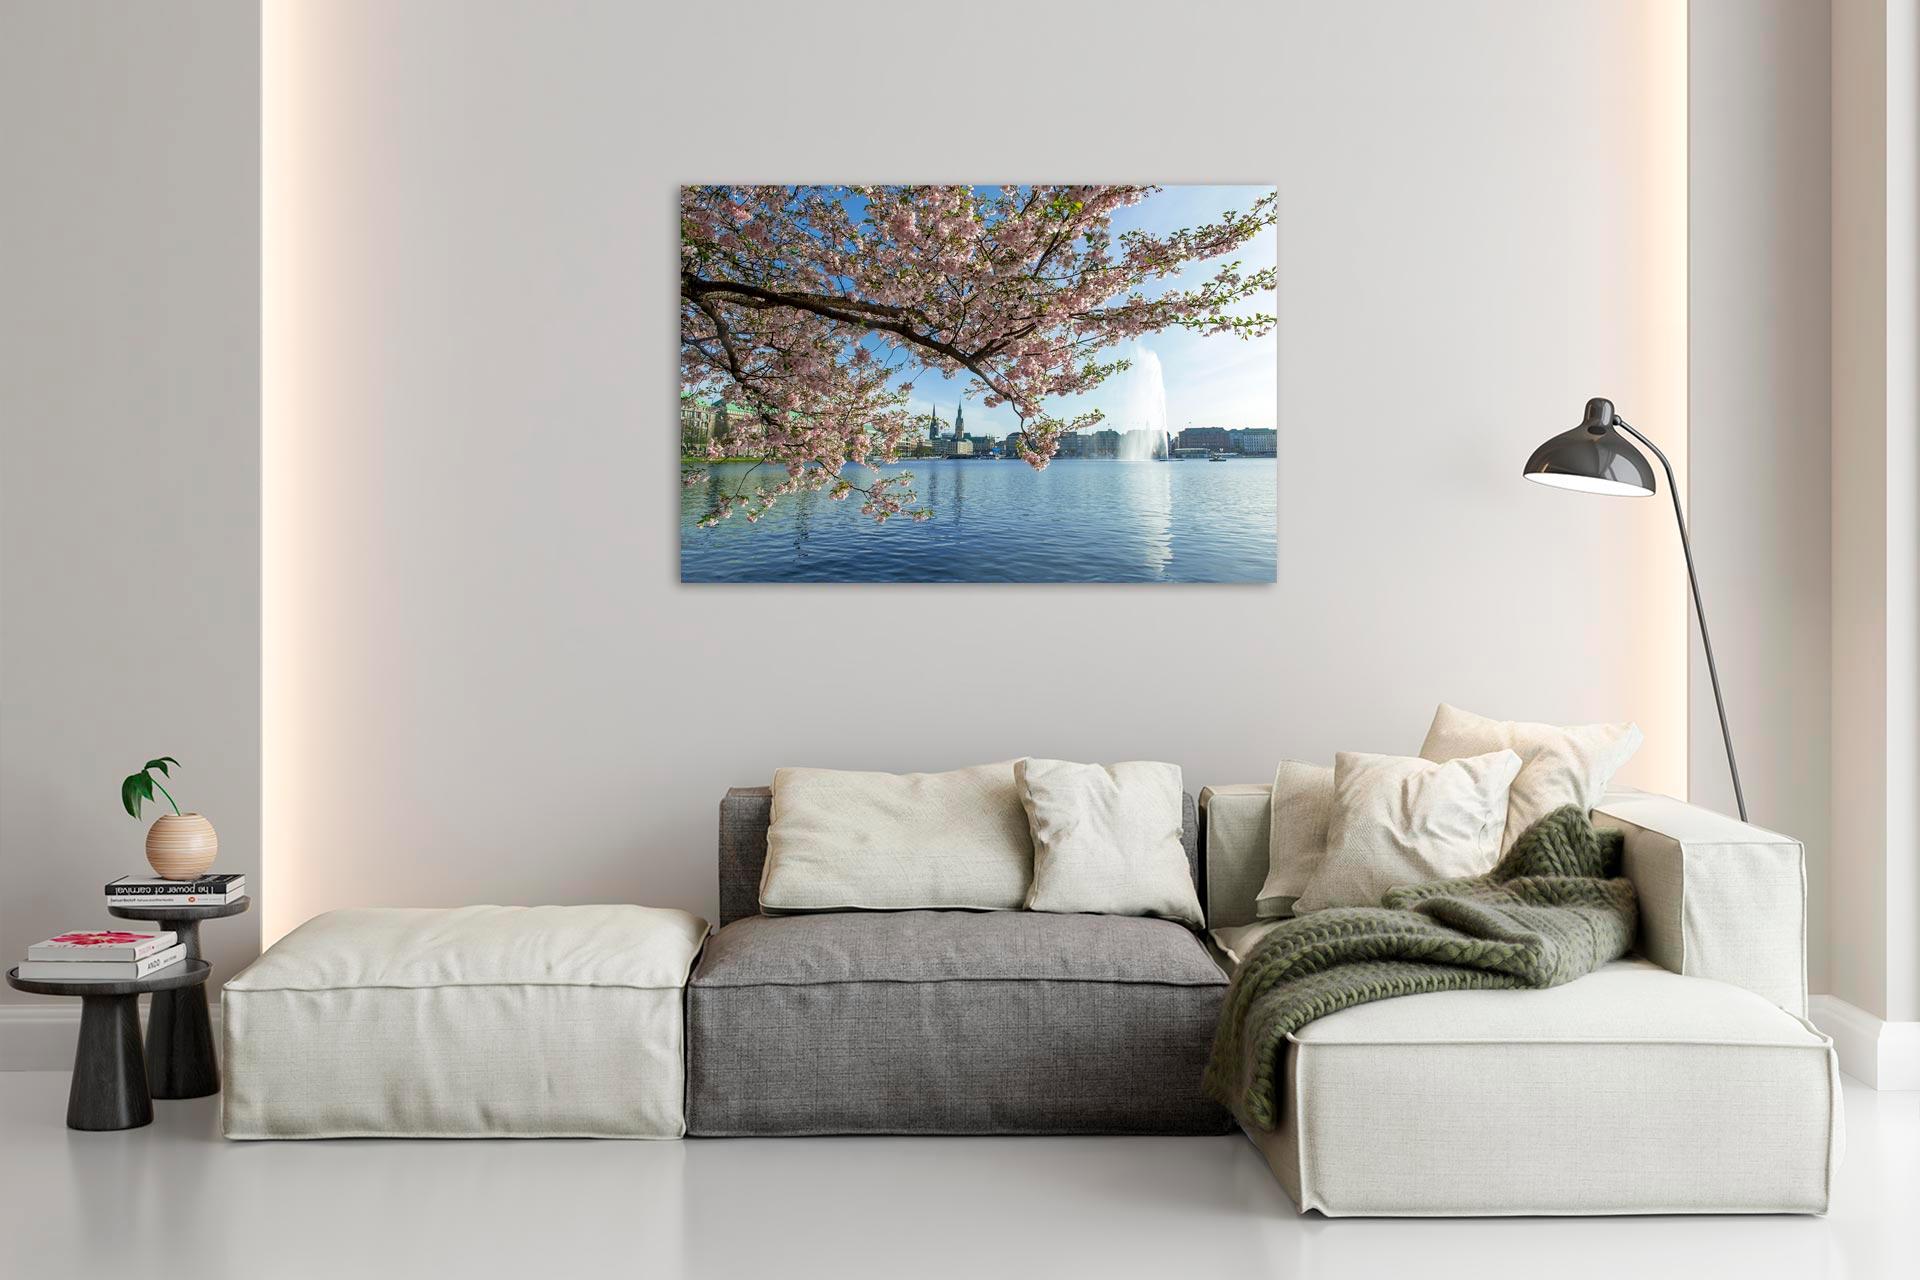 NL033-bluetenzweig-alster-wandbild-leinwand-acrylglas-aludibond-wohnzimmer